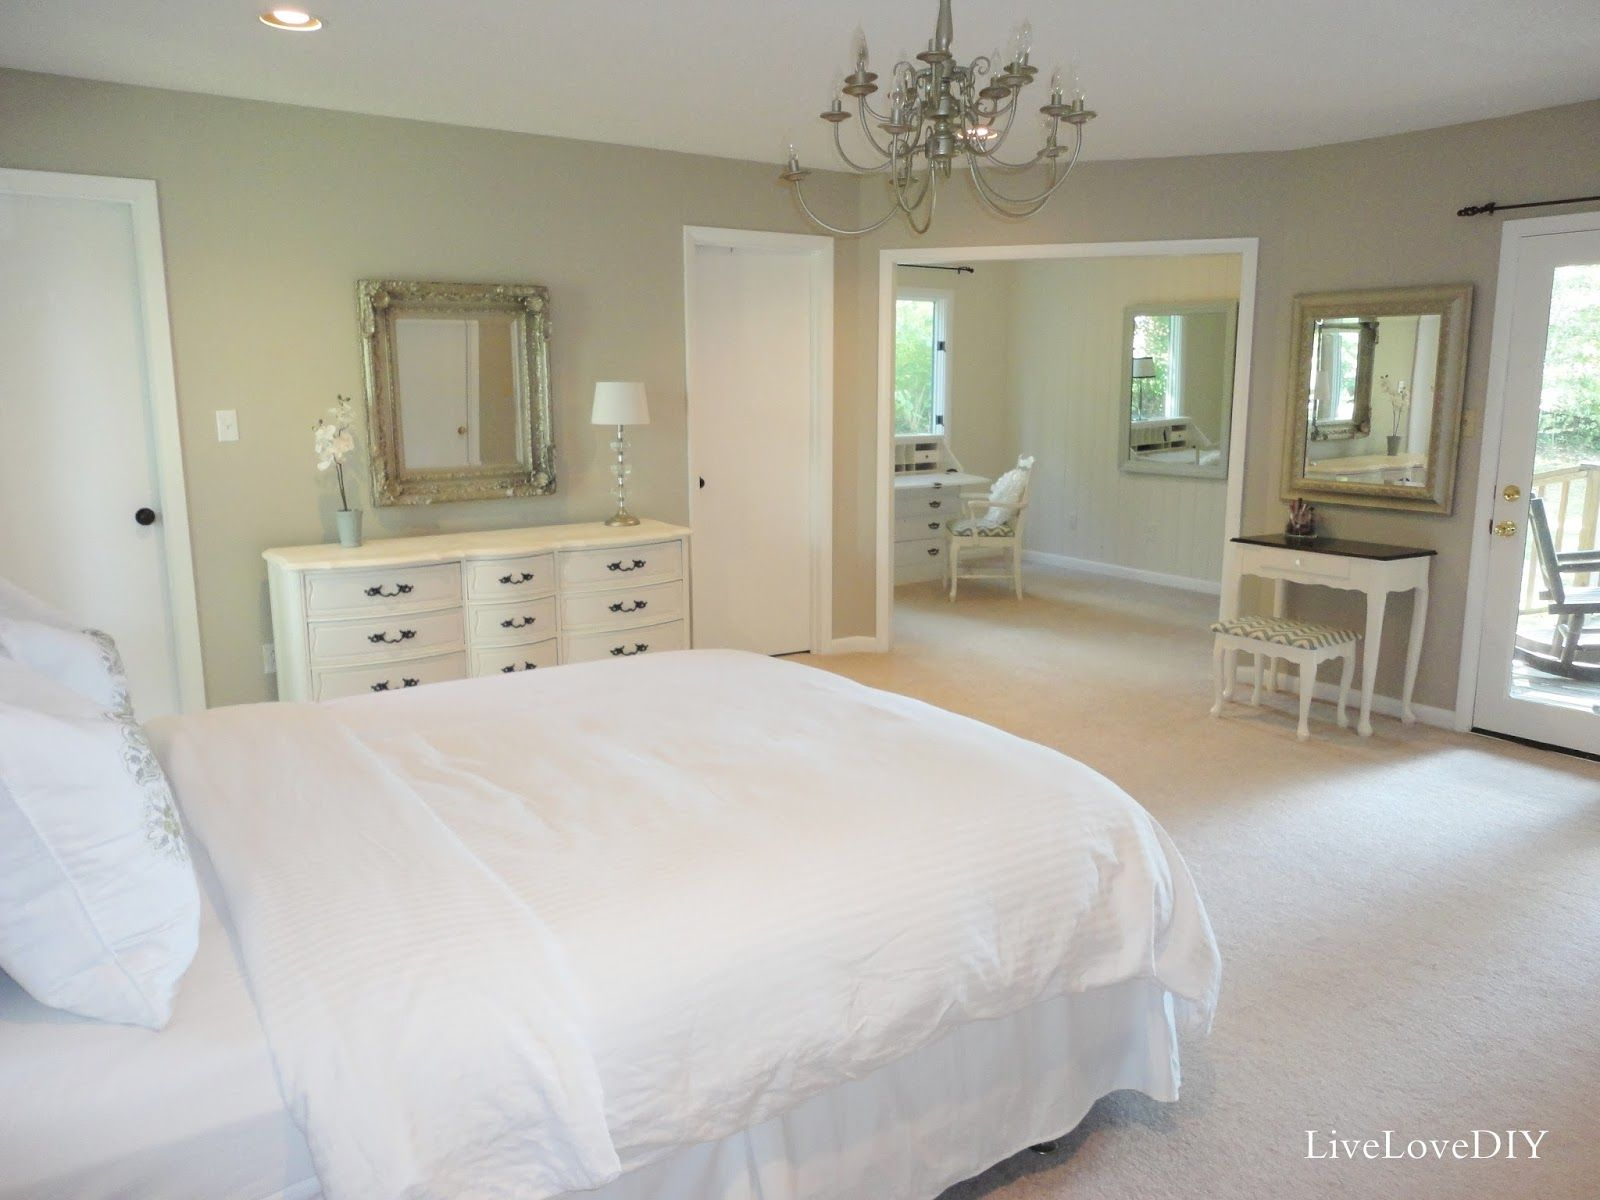 Livelovediy Decorating Mistakes & Lessons 1 Bedroom, 10 Ways